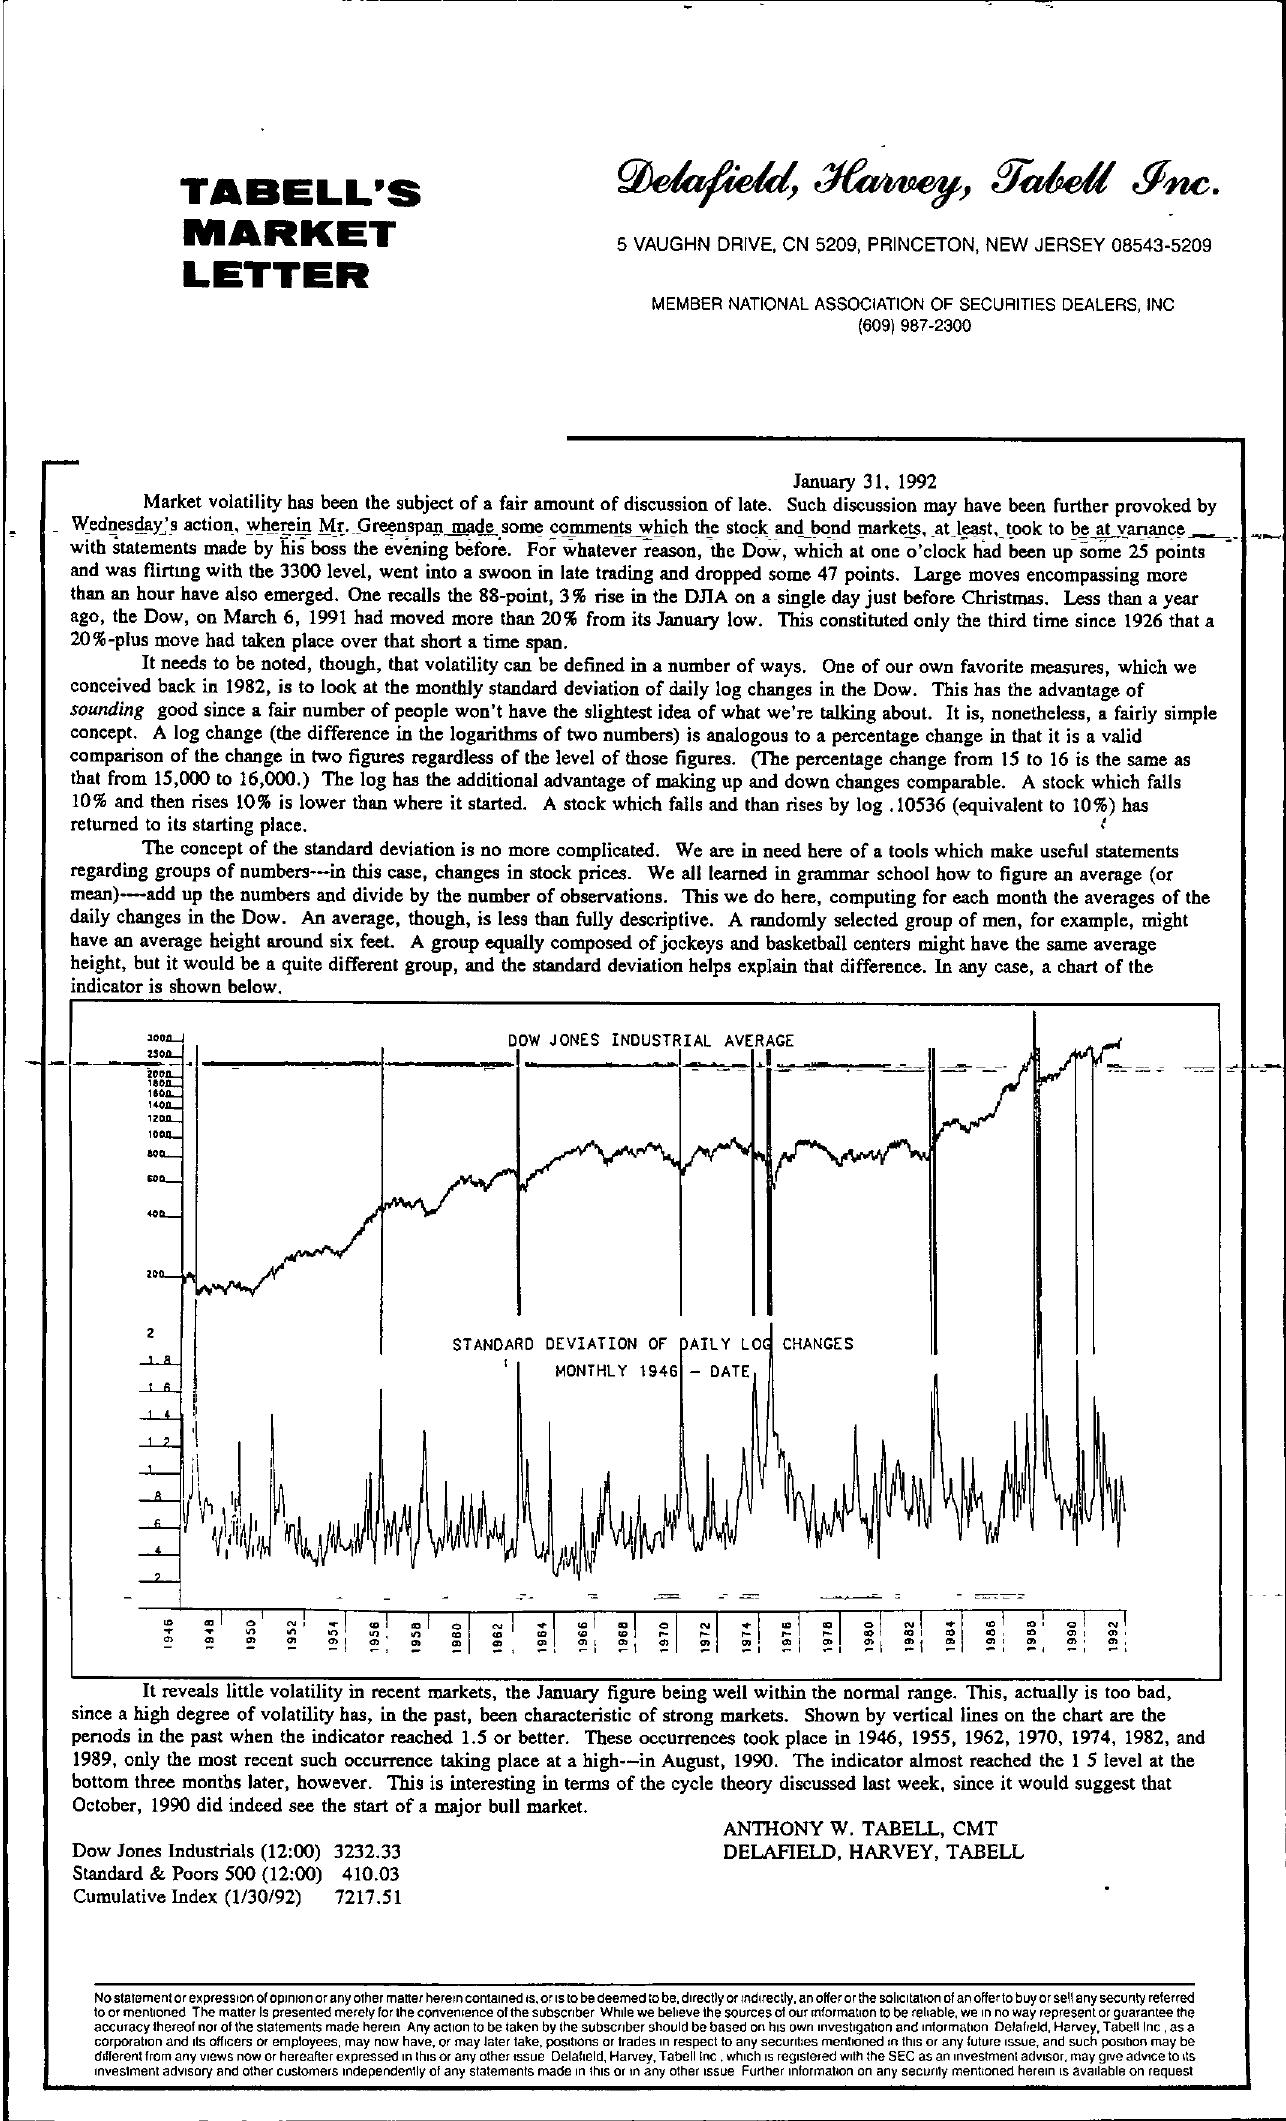 Tabell's Market Letter - January 31, 1992